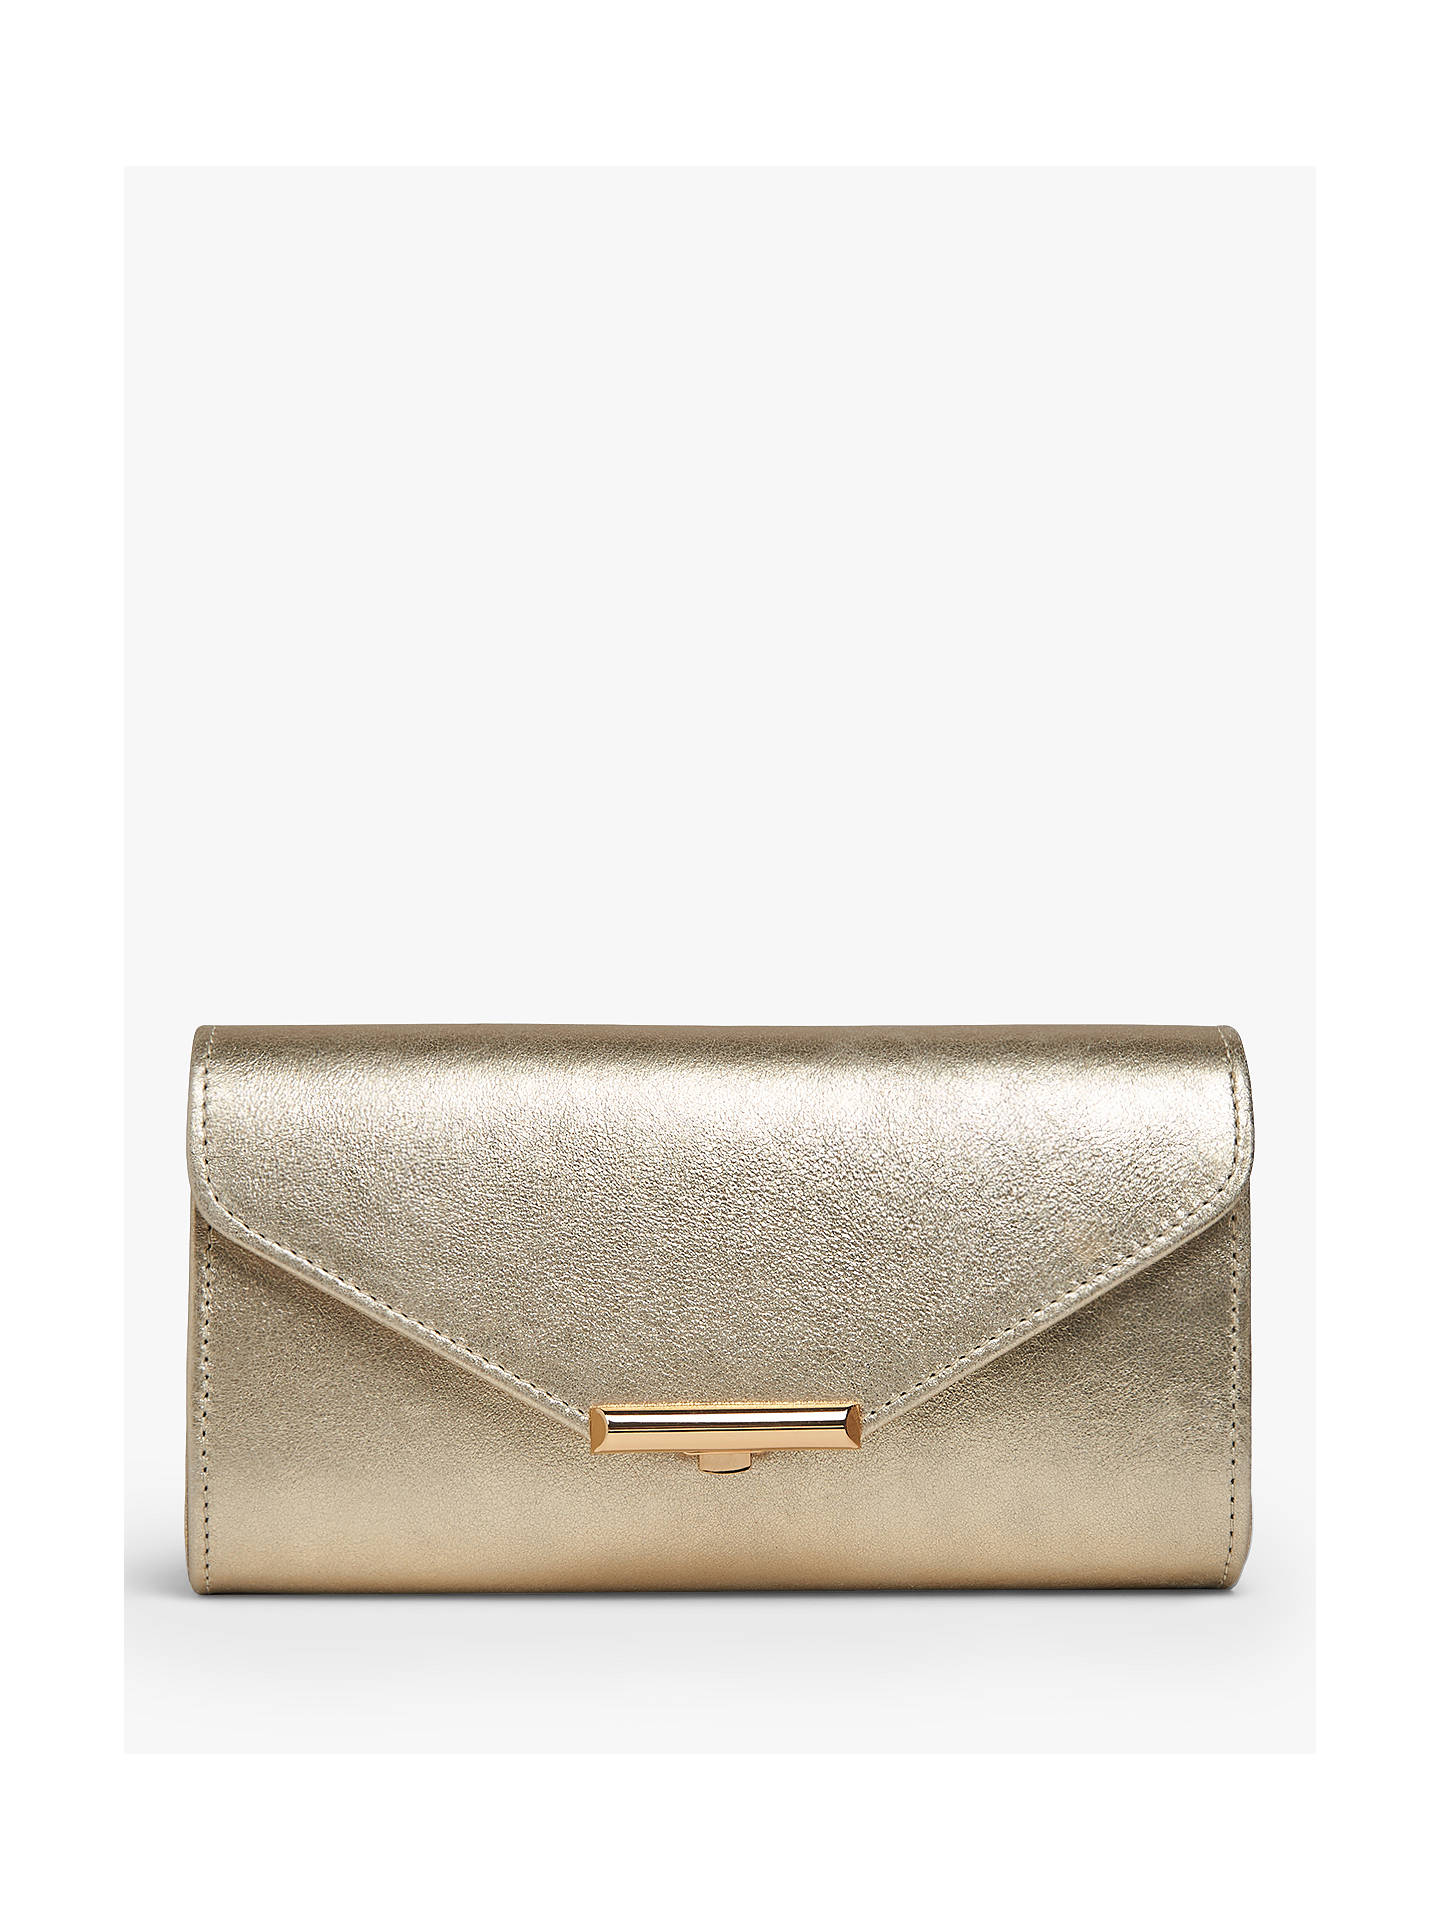 L.K.Bennett Lucy Envelope Leather Clutch